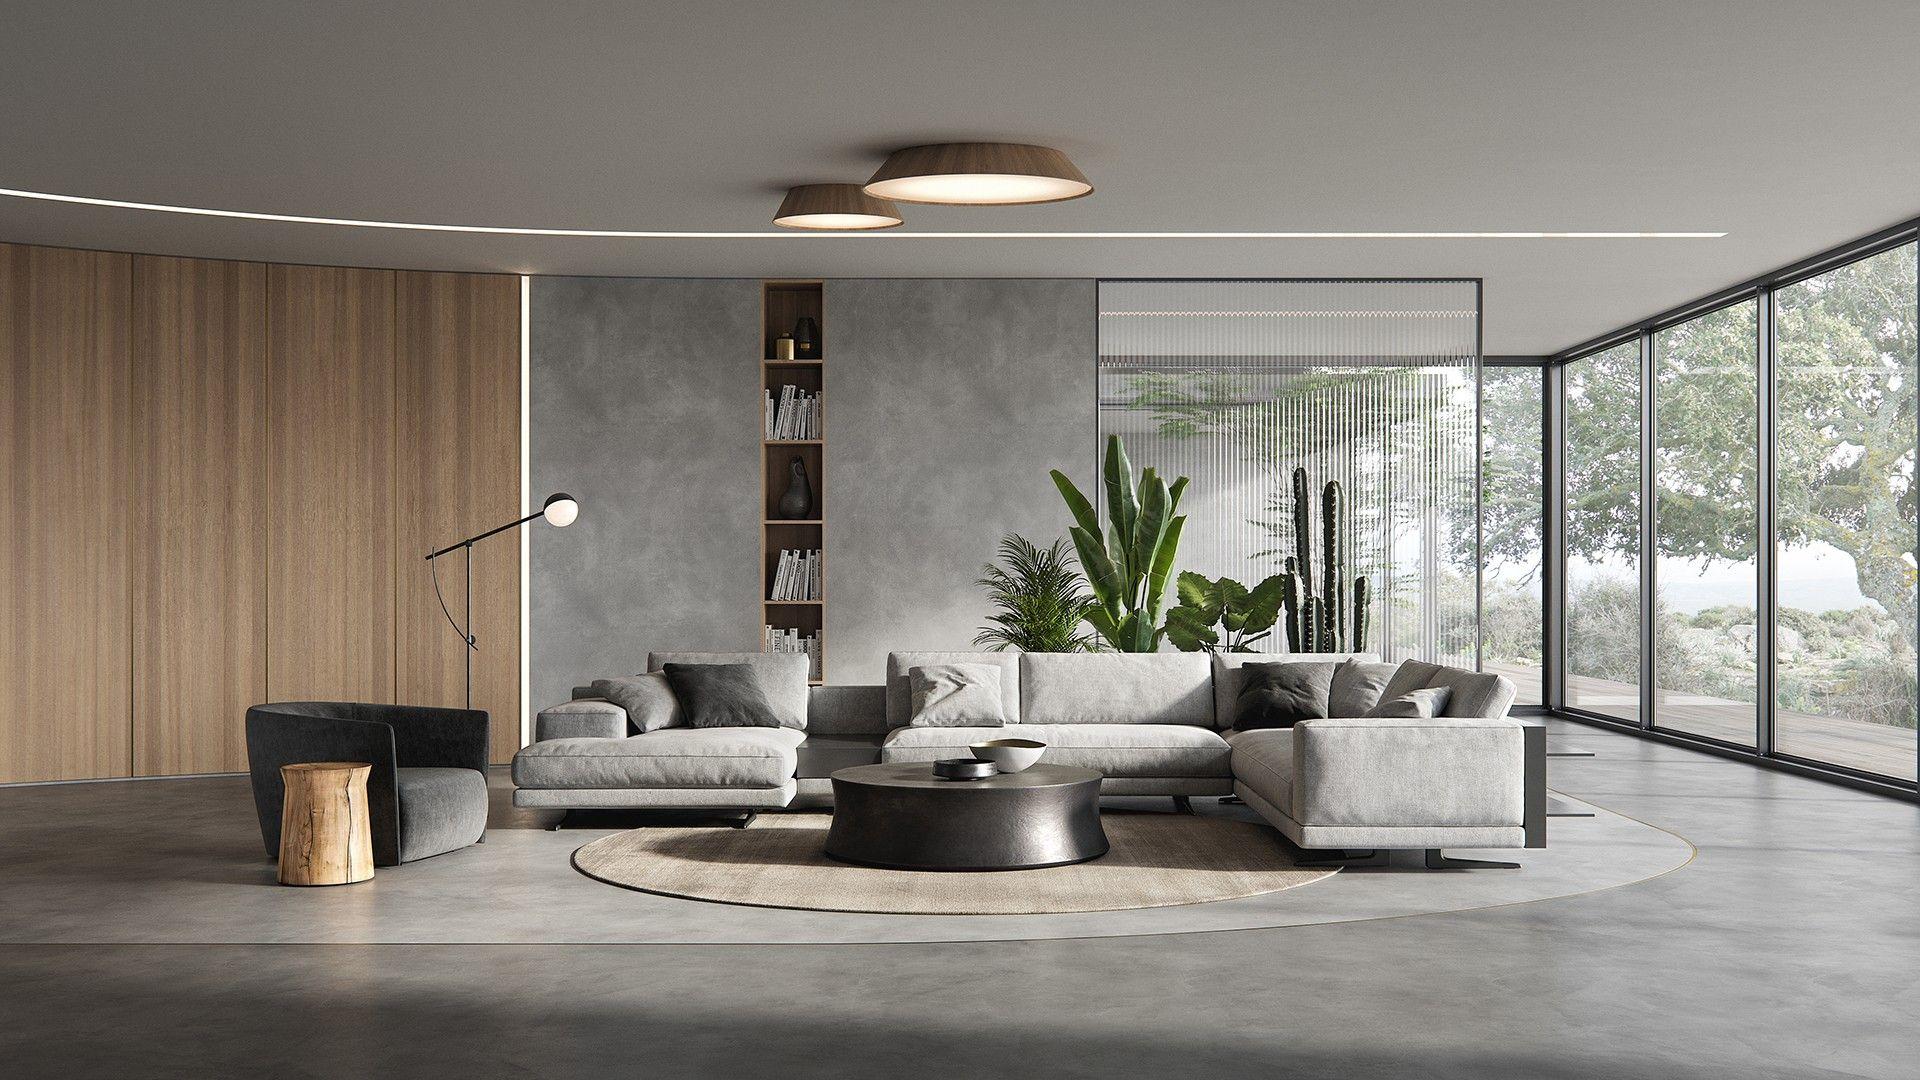 Poliform Living Room Minimal Living Room Modern Contemporary Living Room Contemporary Living Room Design